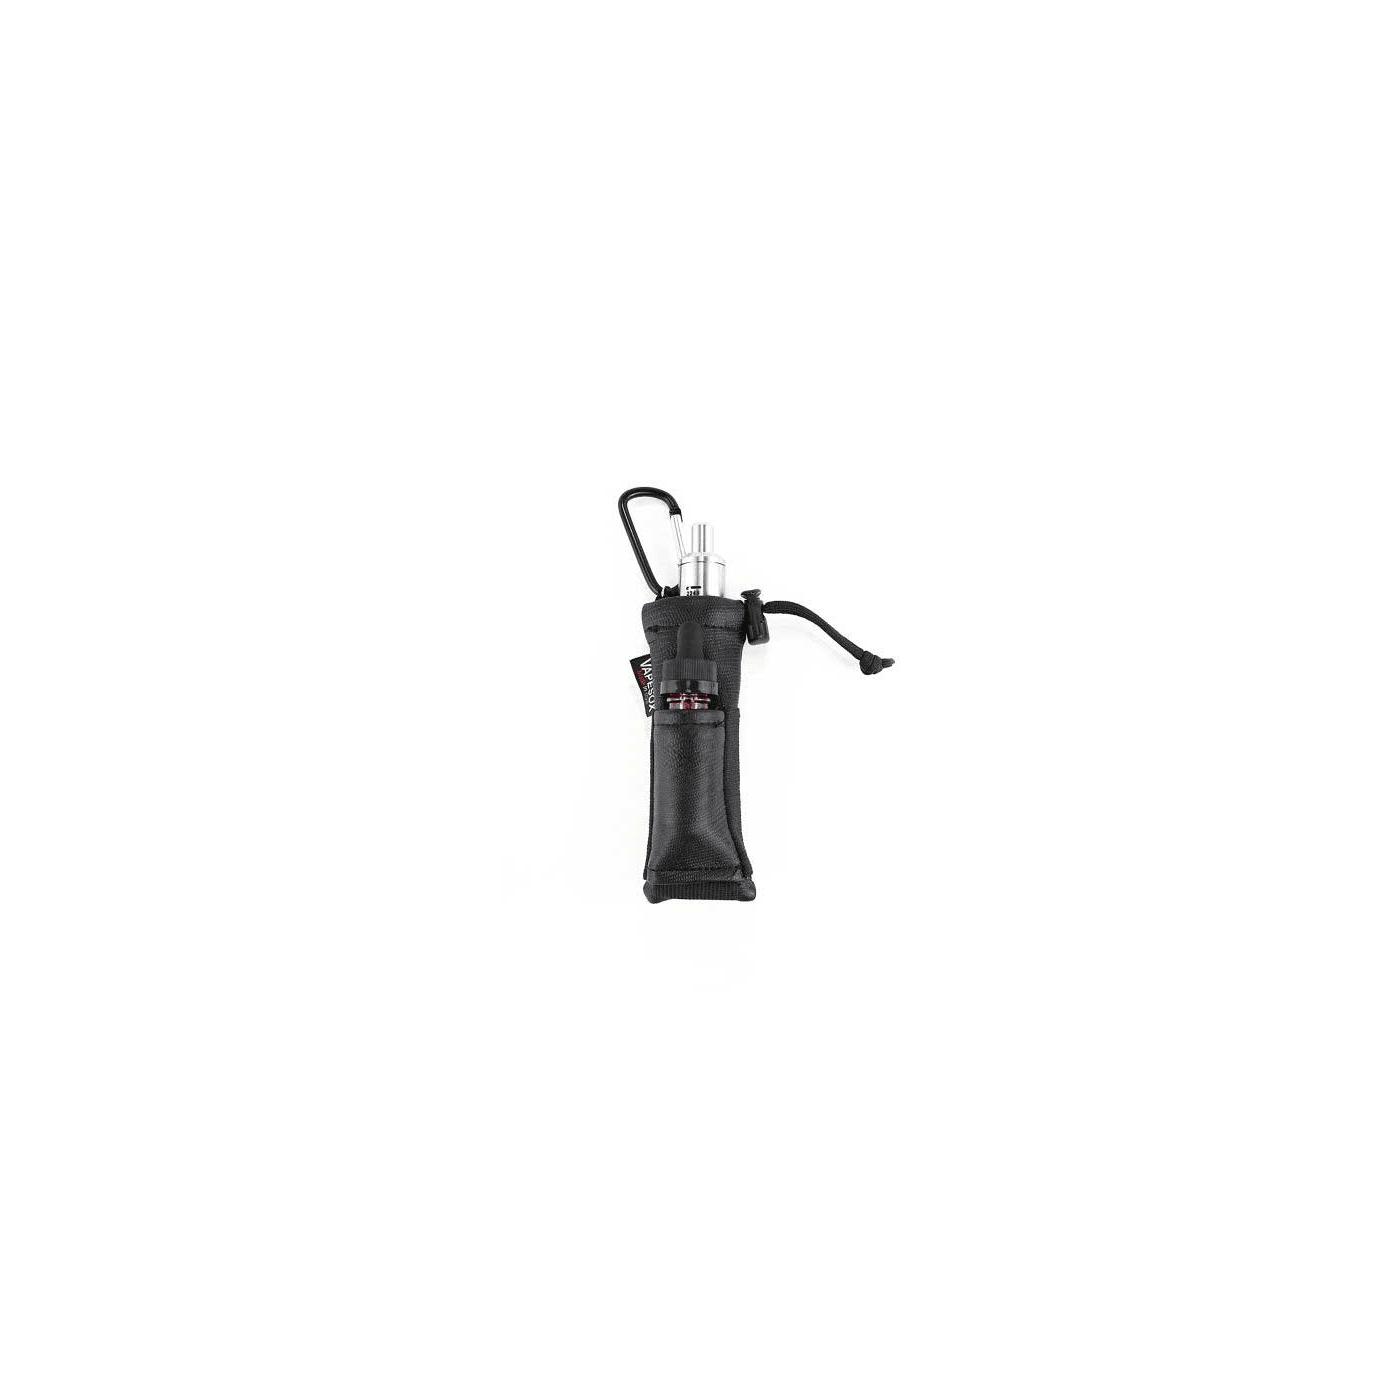 Vapesox VS5 Mod Holder - Black Lizard with Items